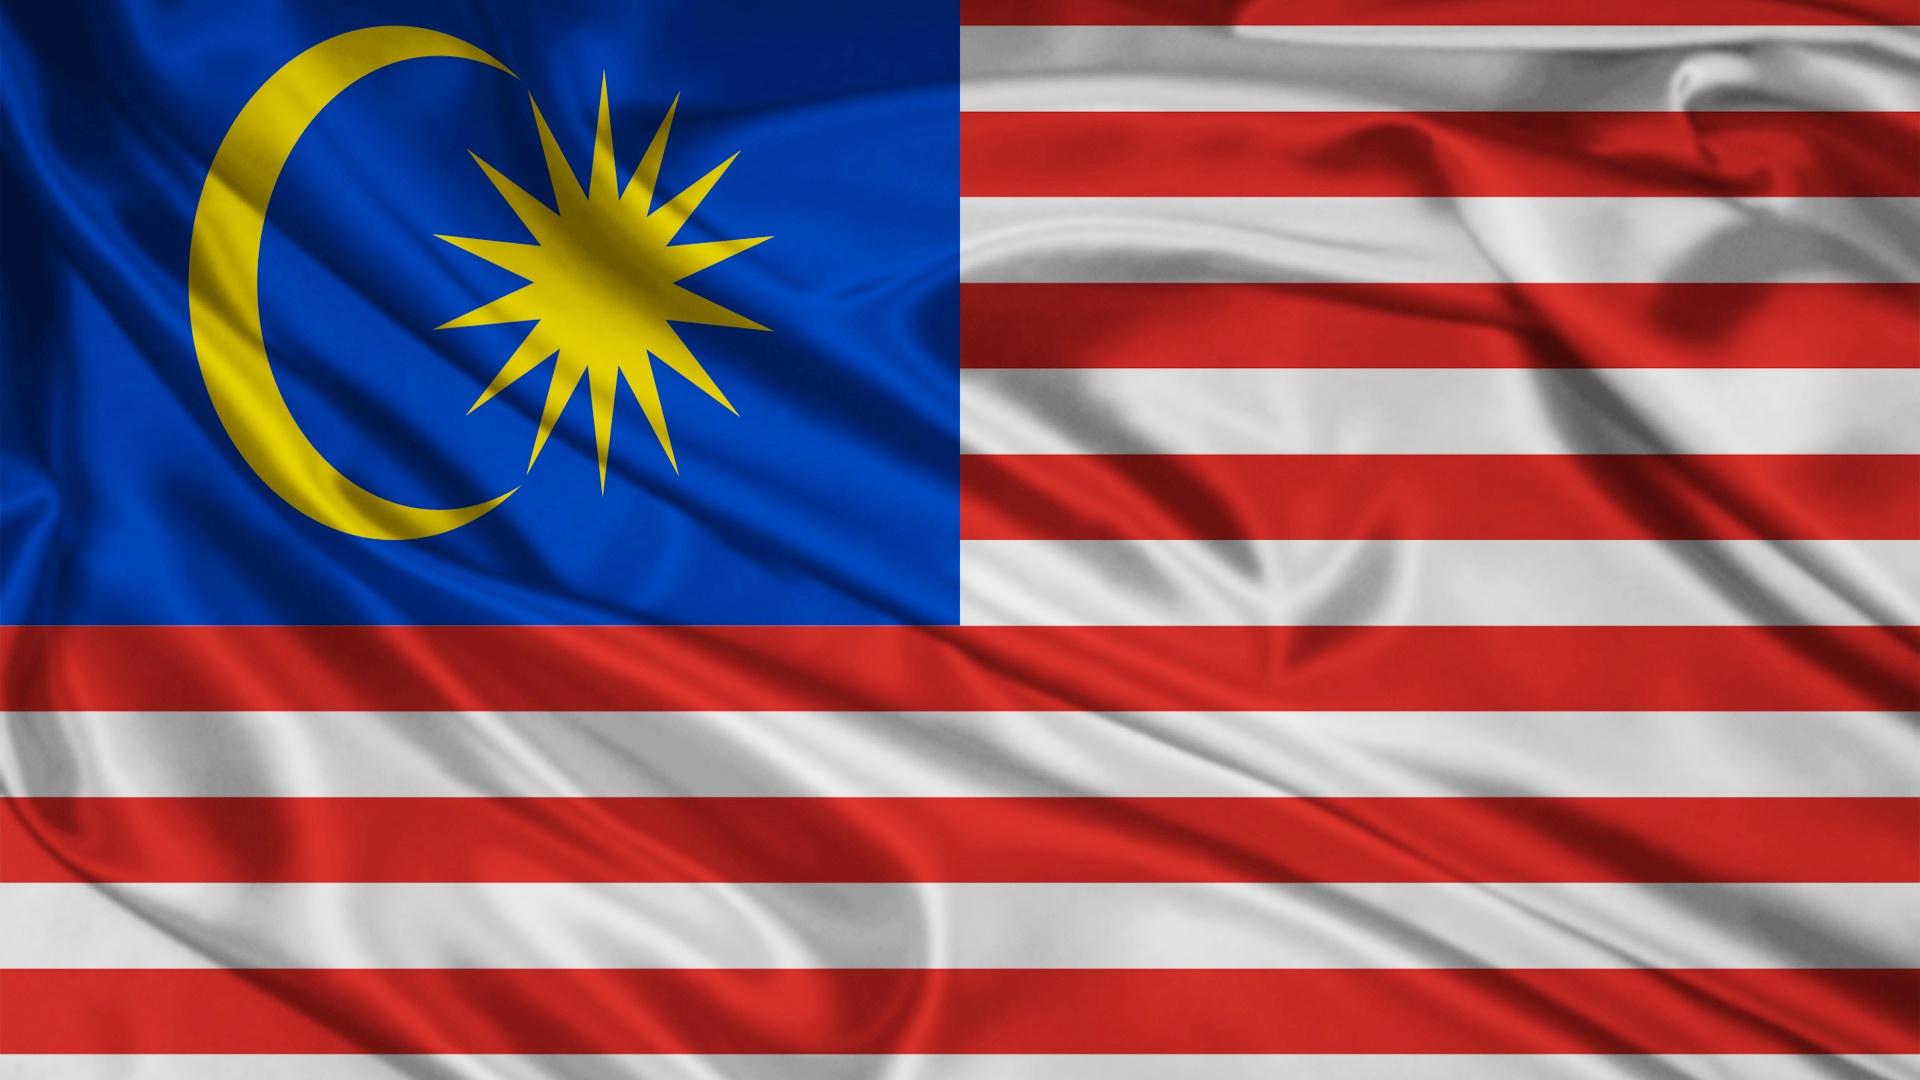 1920x1080 Malaysia Flag desktop PC and Mac wallpaper 1920x1080